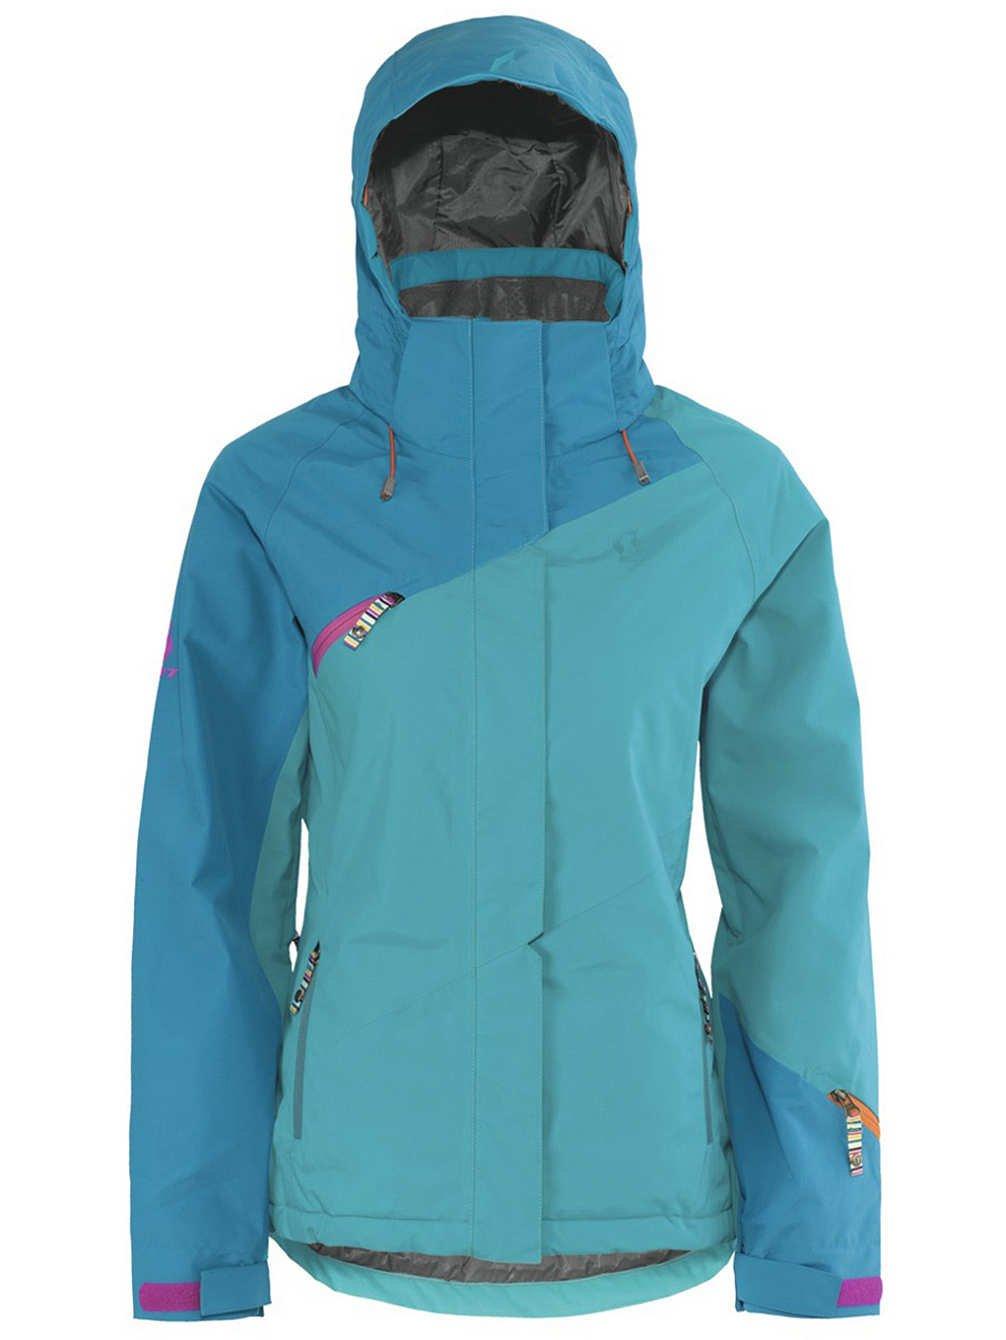 Damen Snowboard Jacke Scott Octavia Jacket günstig